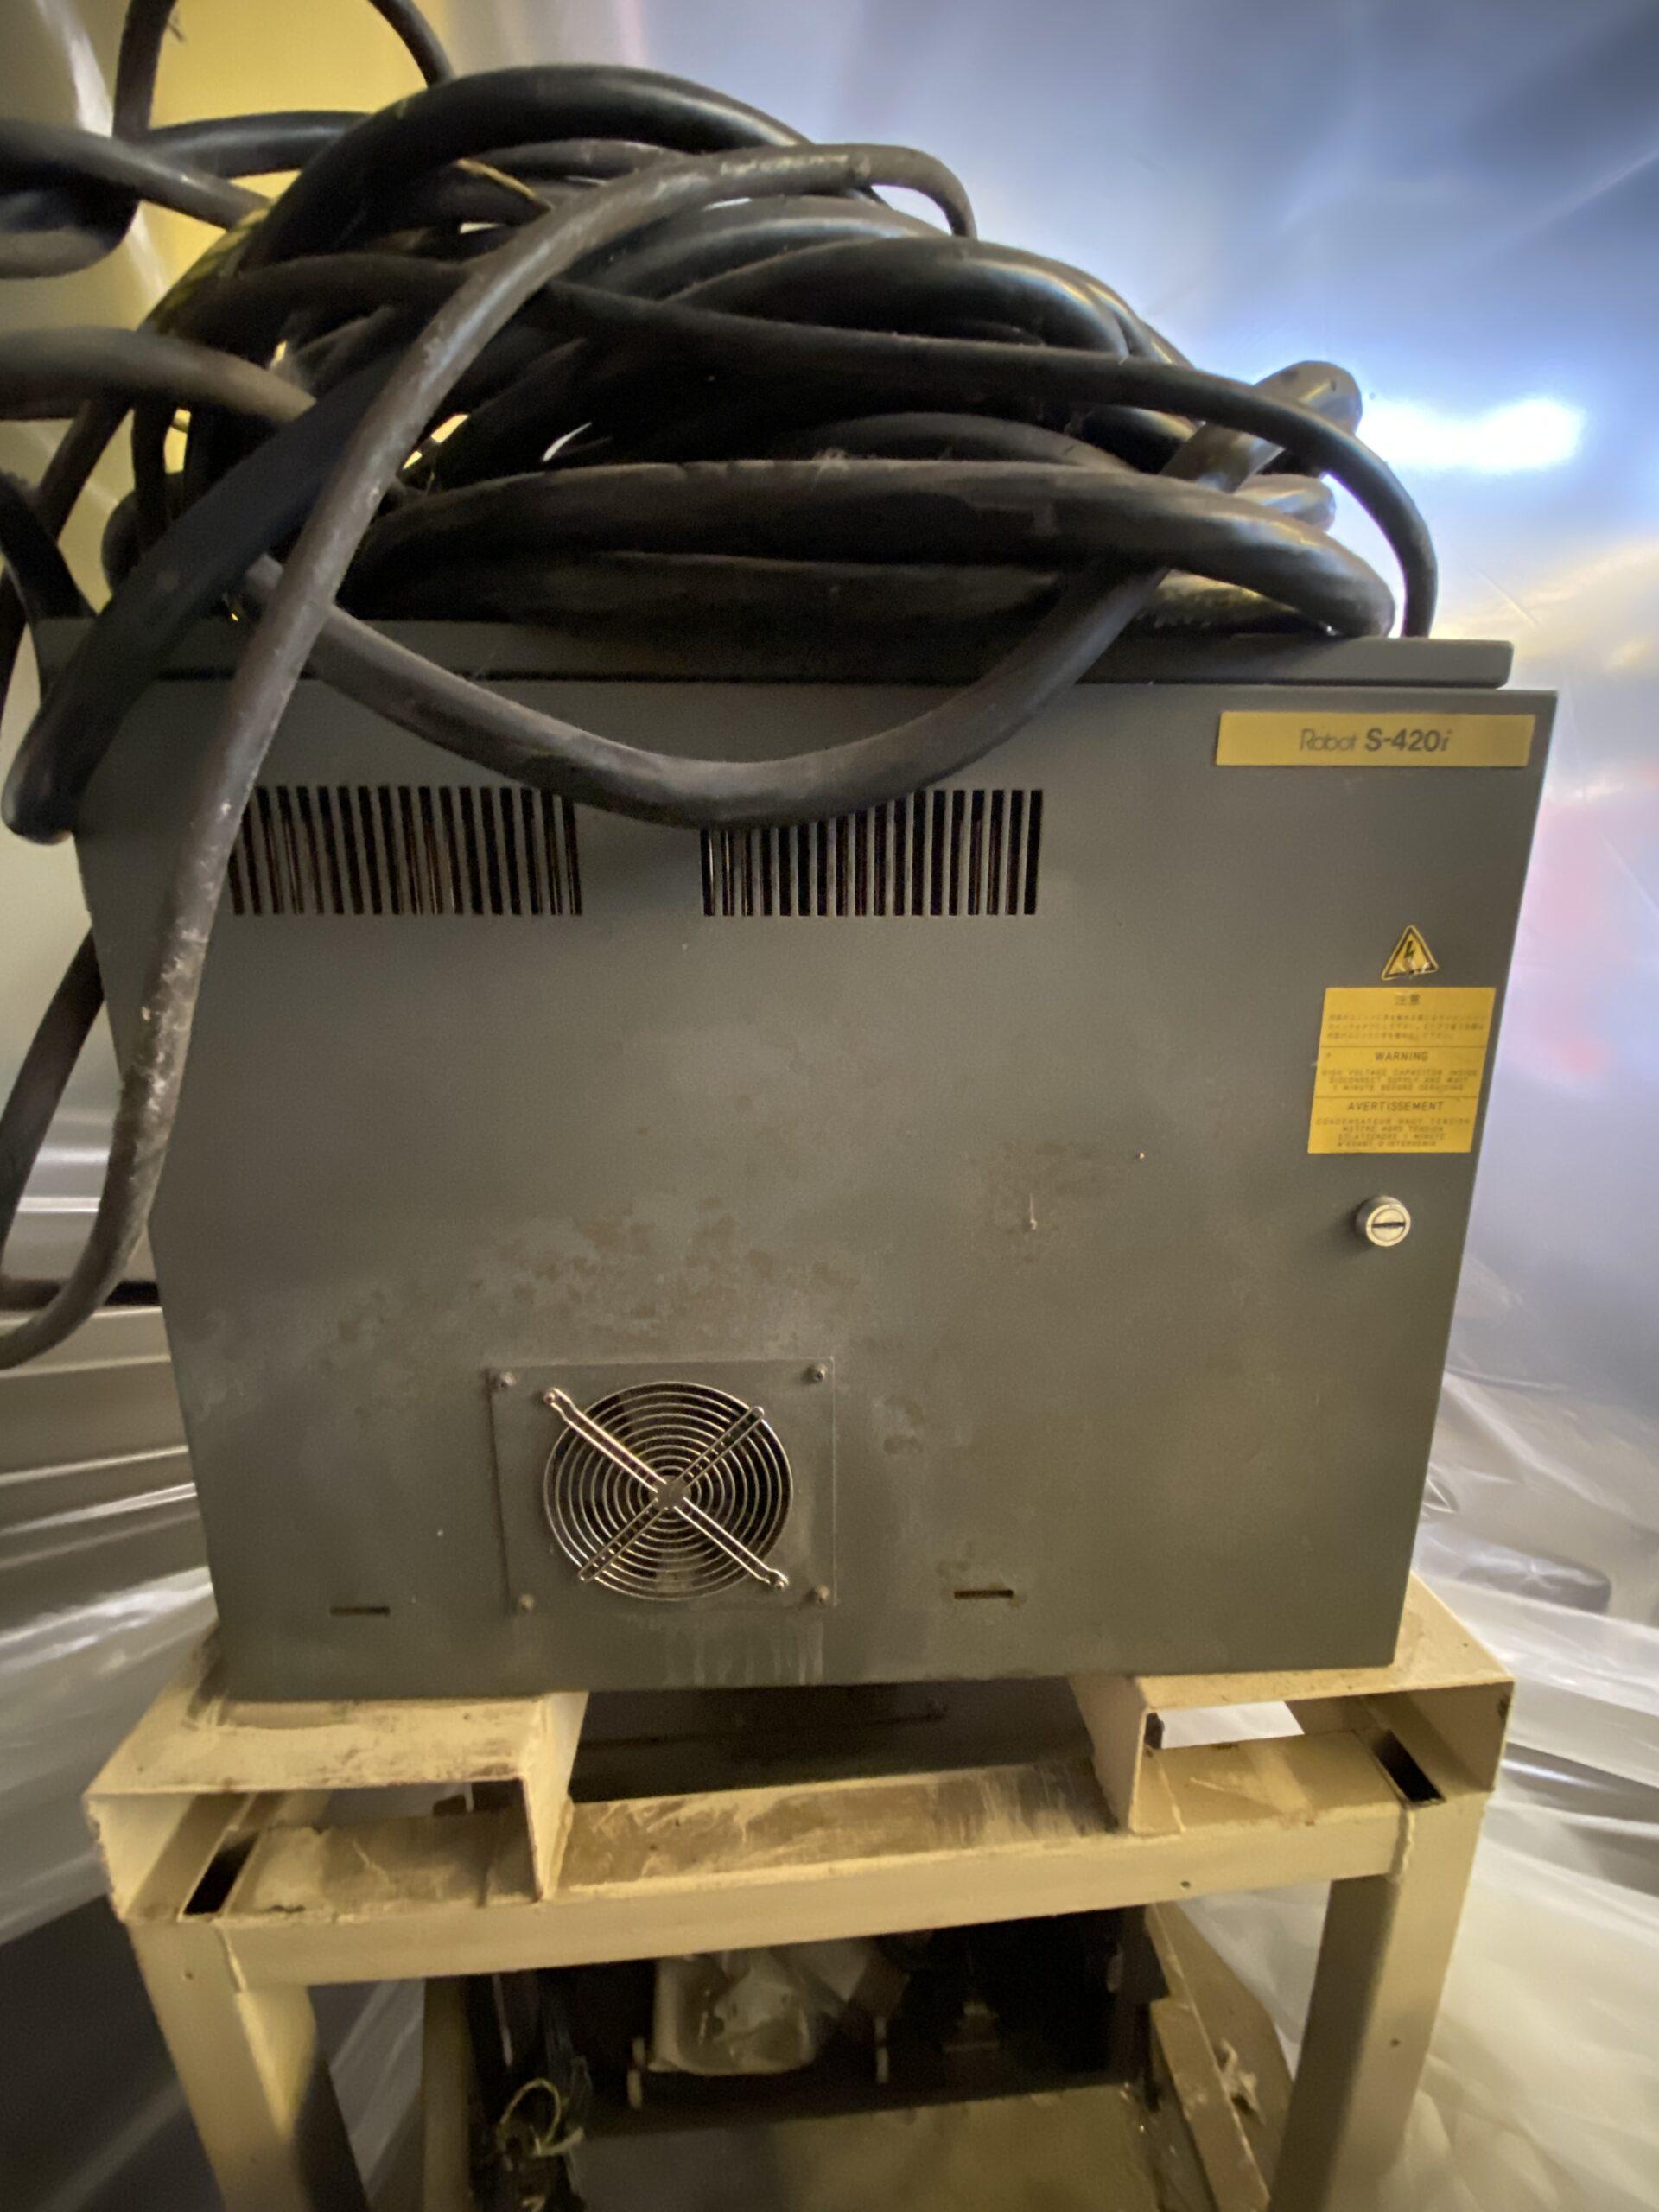 Used Fanuc S-420iW Robot #4292